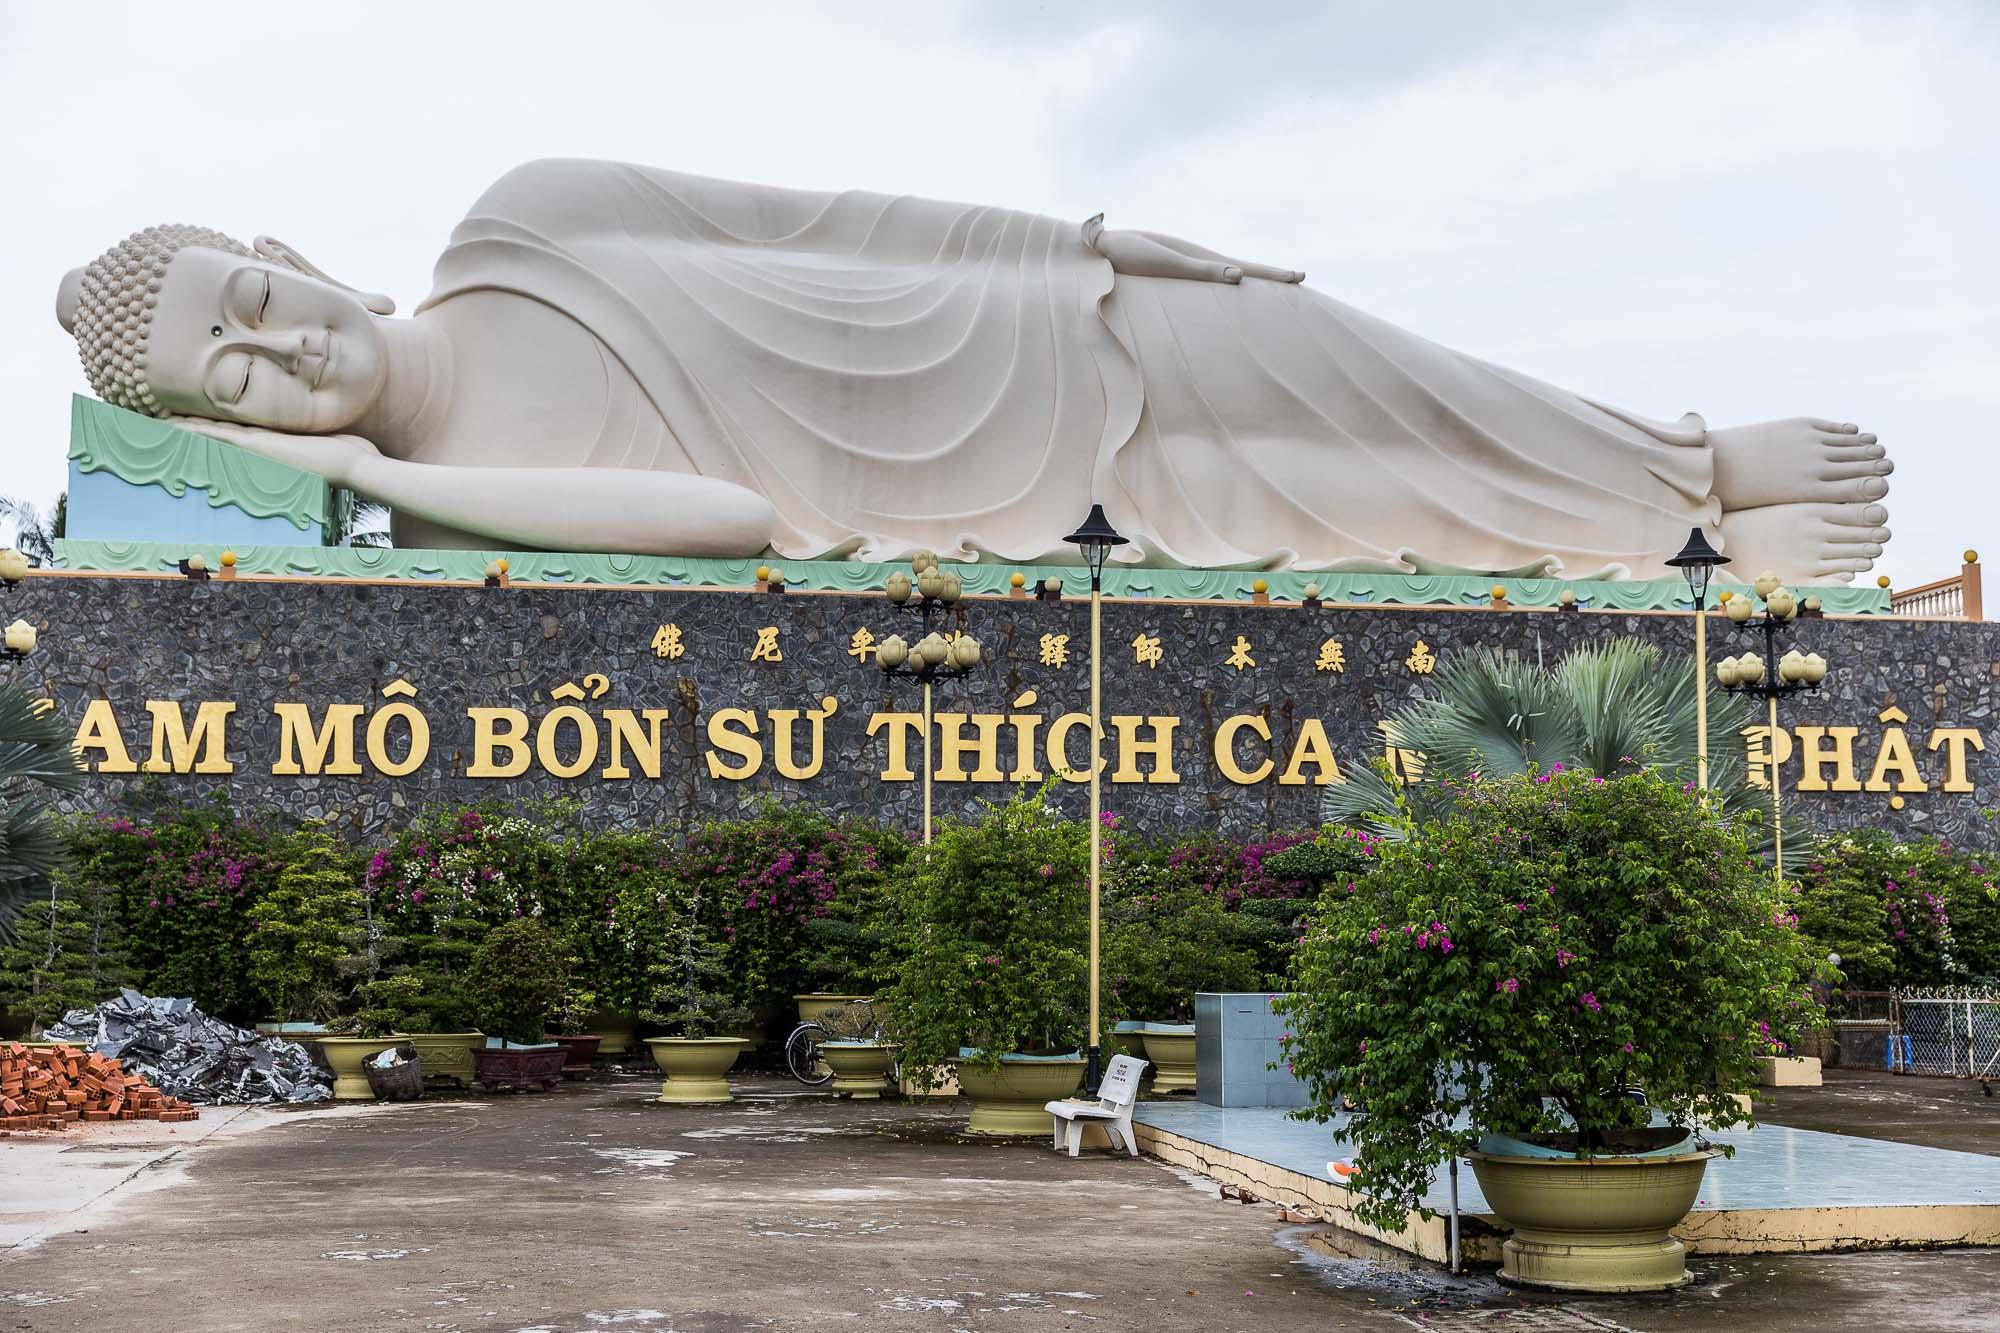 vietnam_2016_hcmc_jusmedic_202